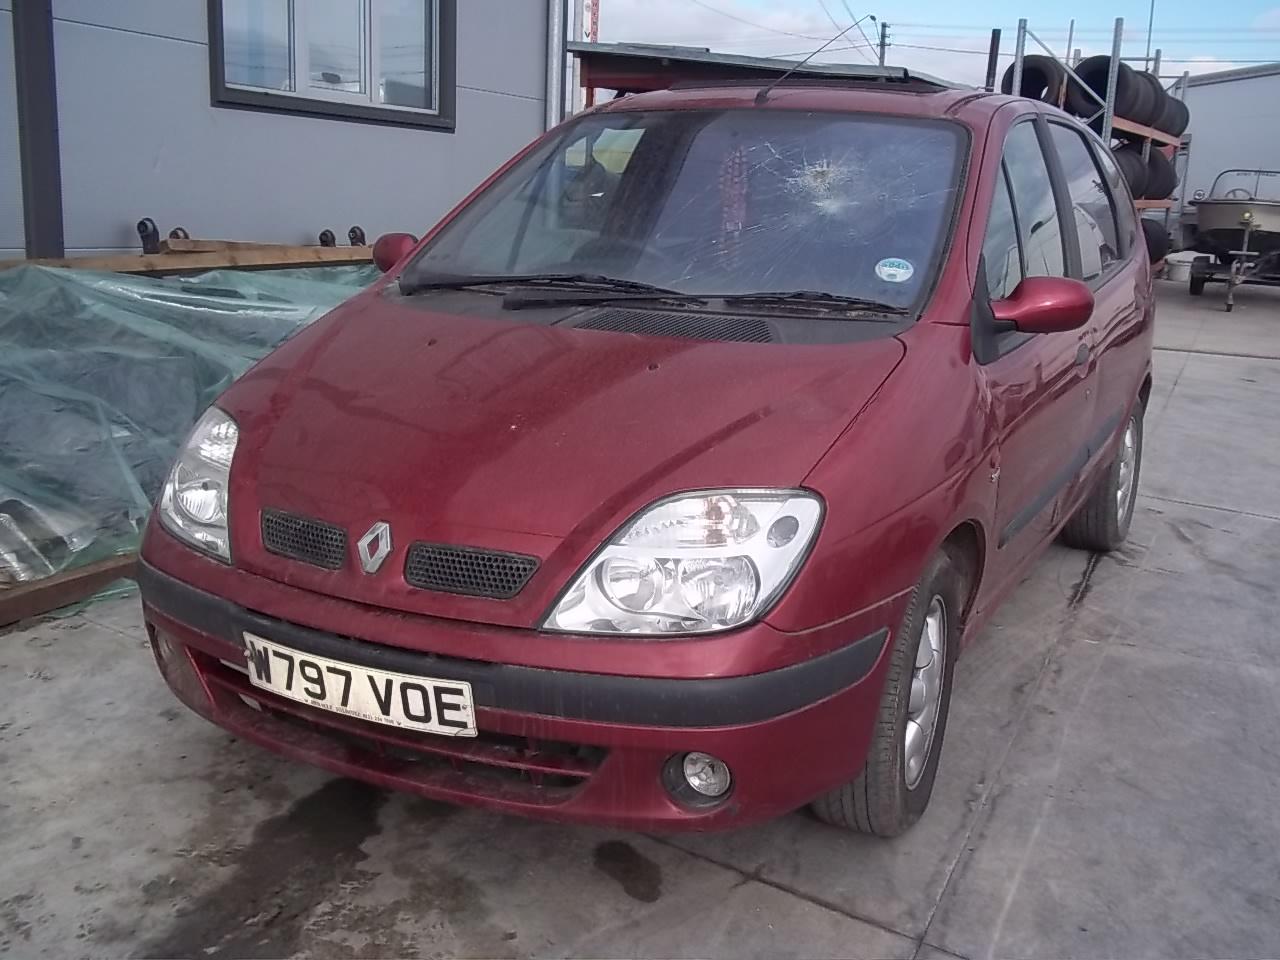 Dezmembrez Renault Scenic 2001 Benzina Hatchback - 04 Ianuarie 2013 - Poza 3